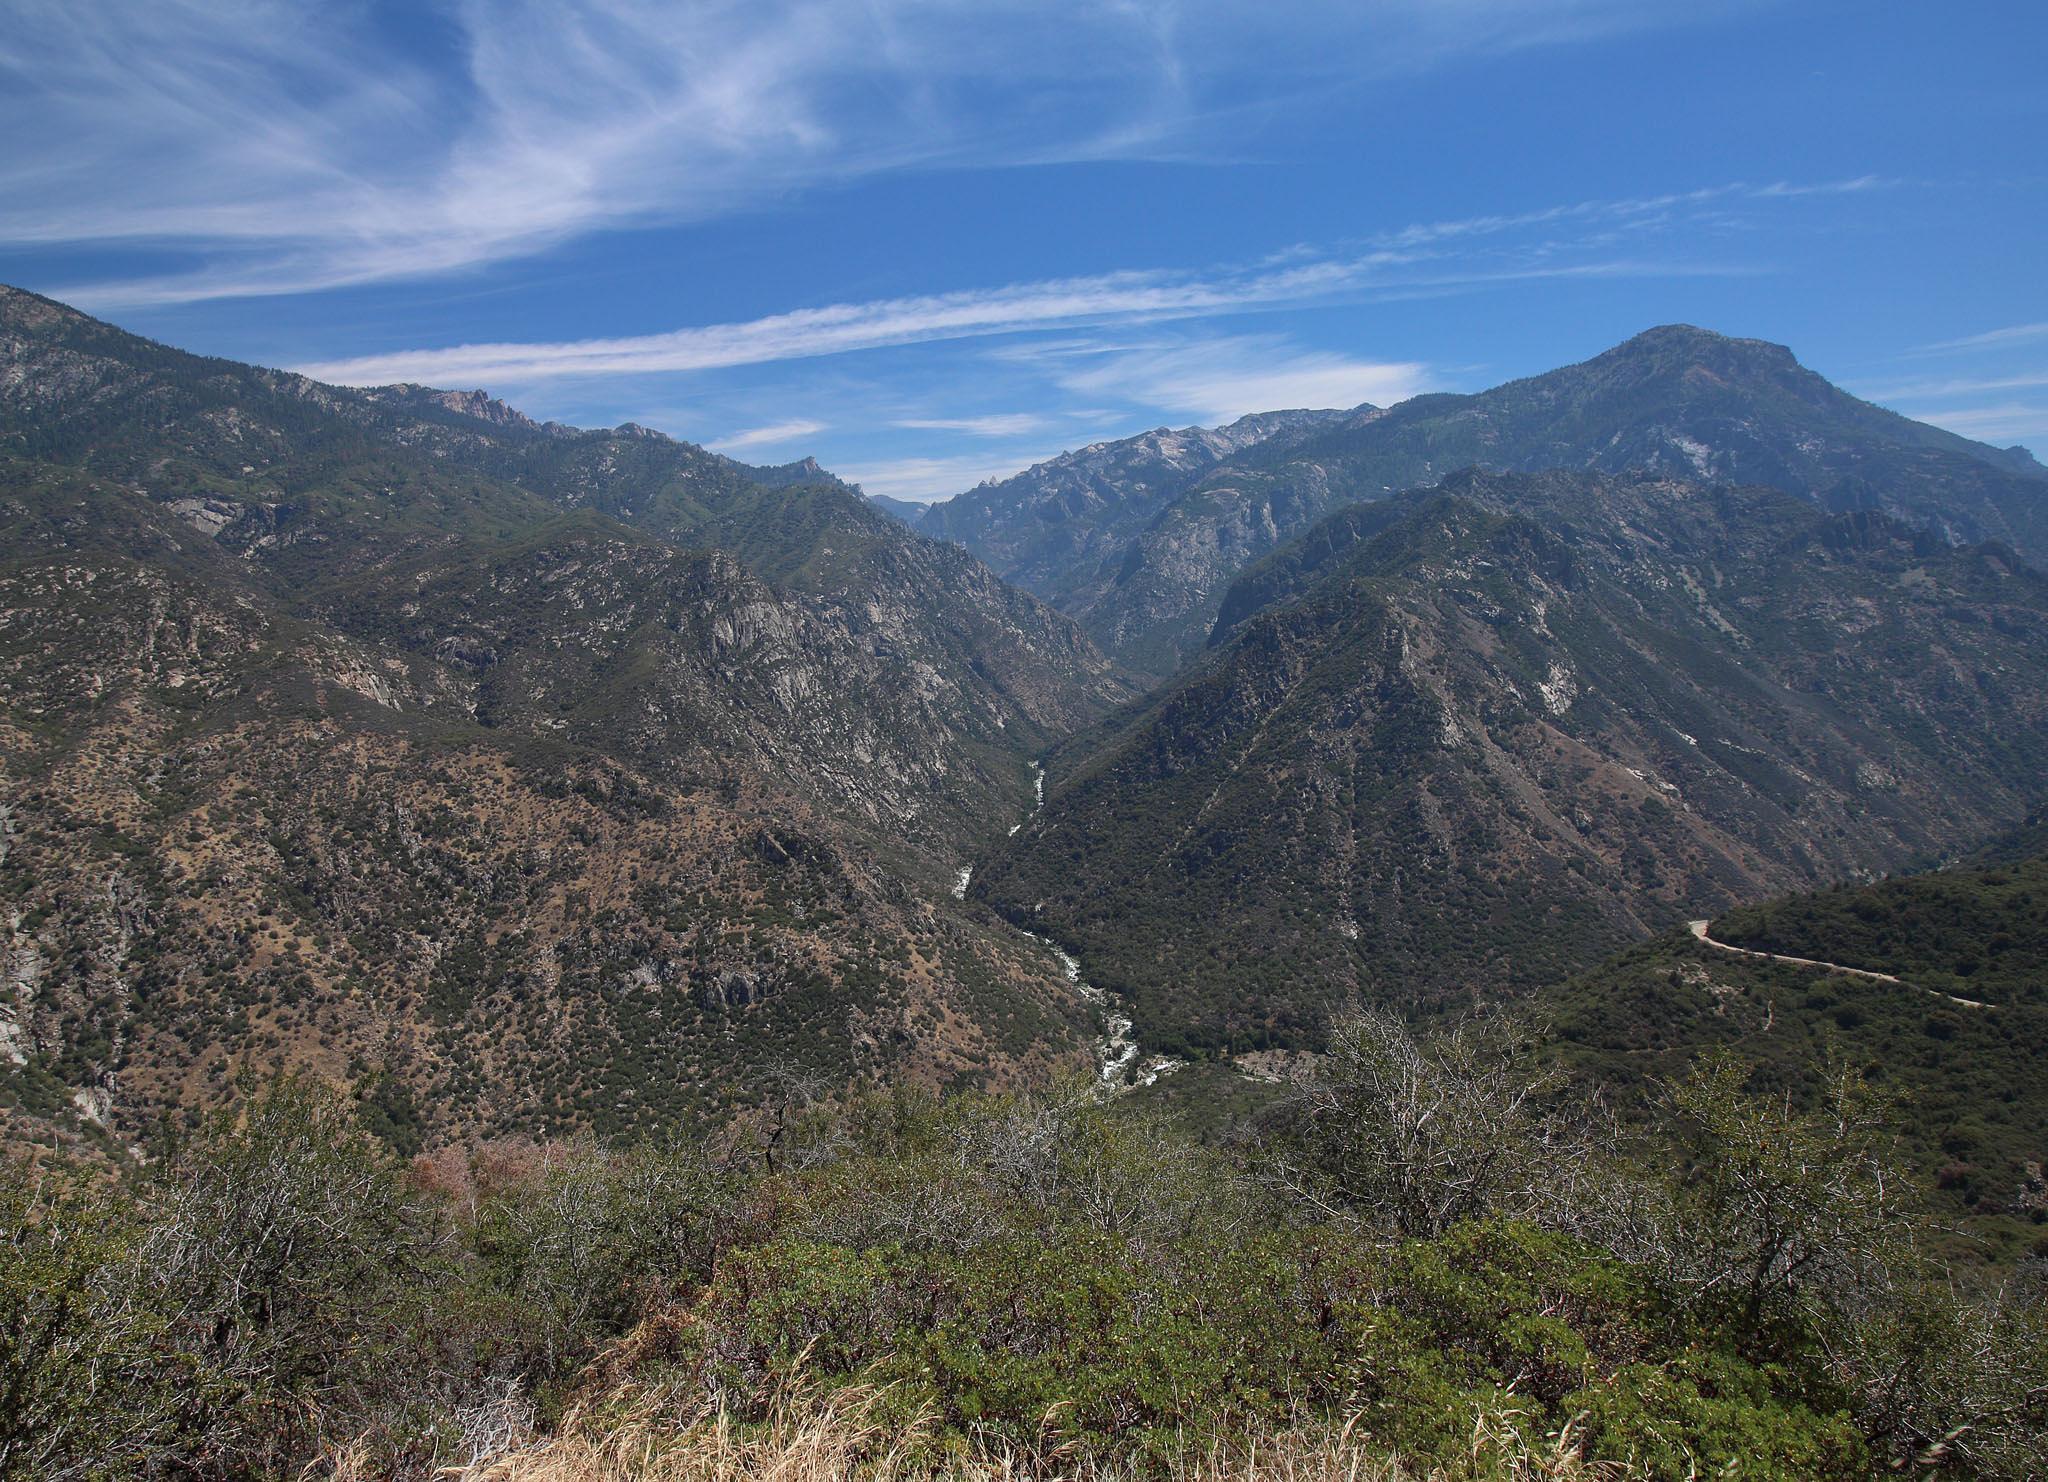 Looking Back at Kings Canyon by Rita Simmonds